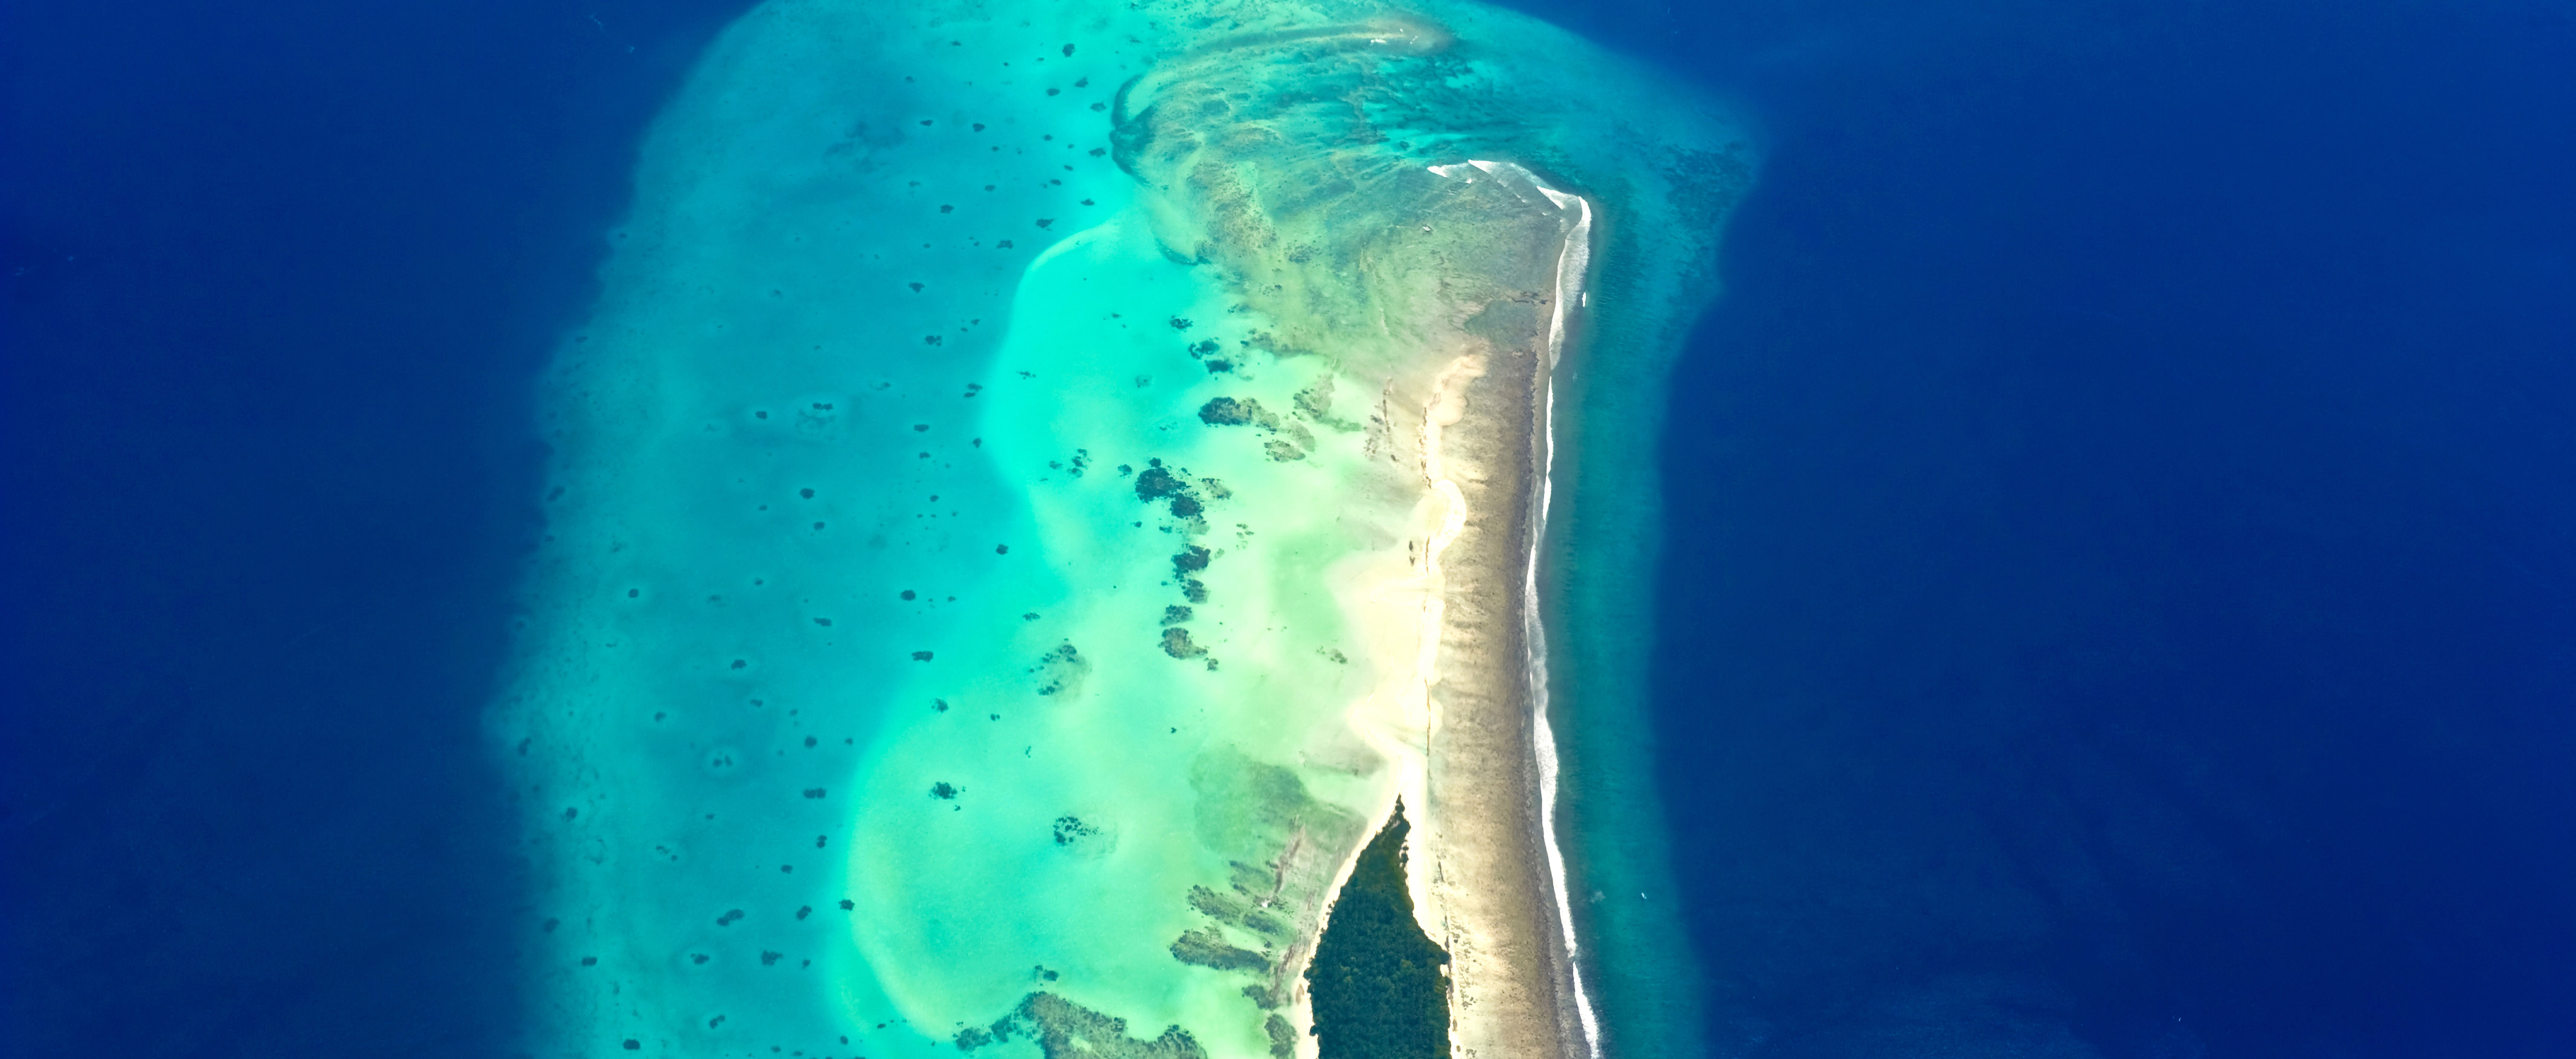 Perlen im Indischen Ozean, Malediven ©Johannes Raterman